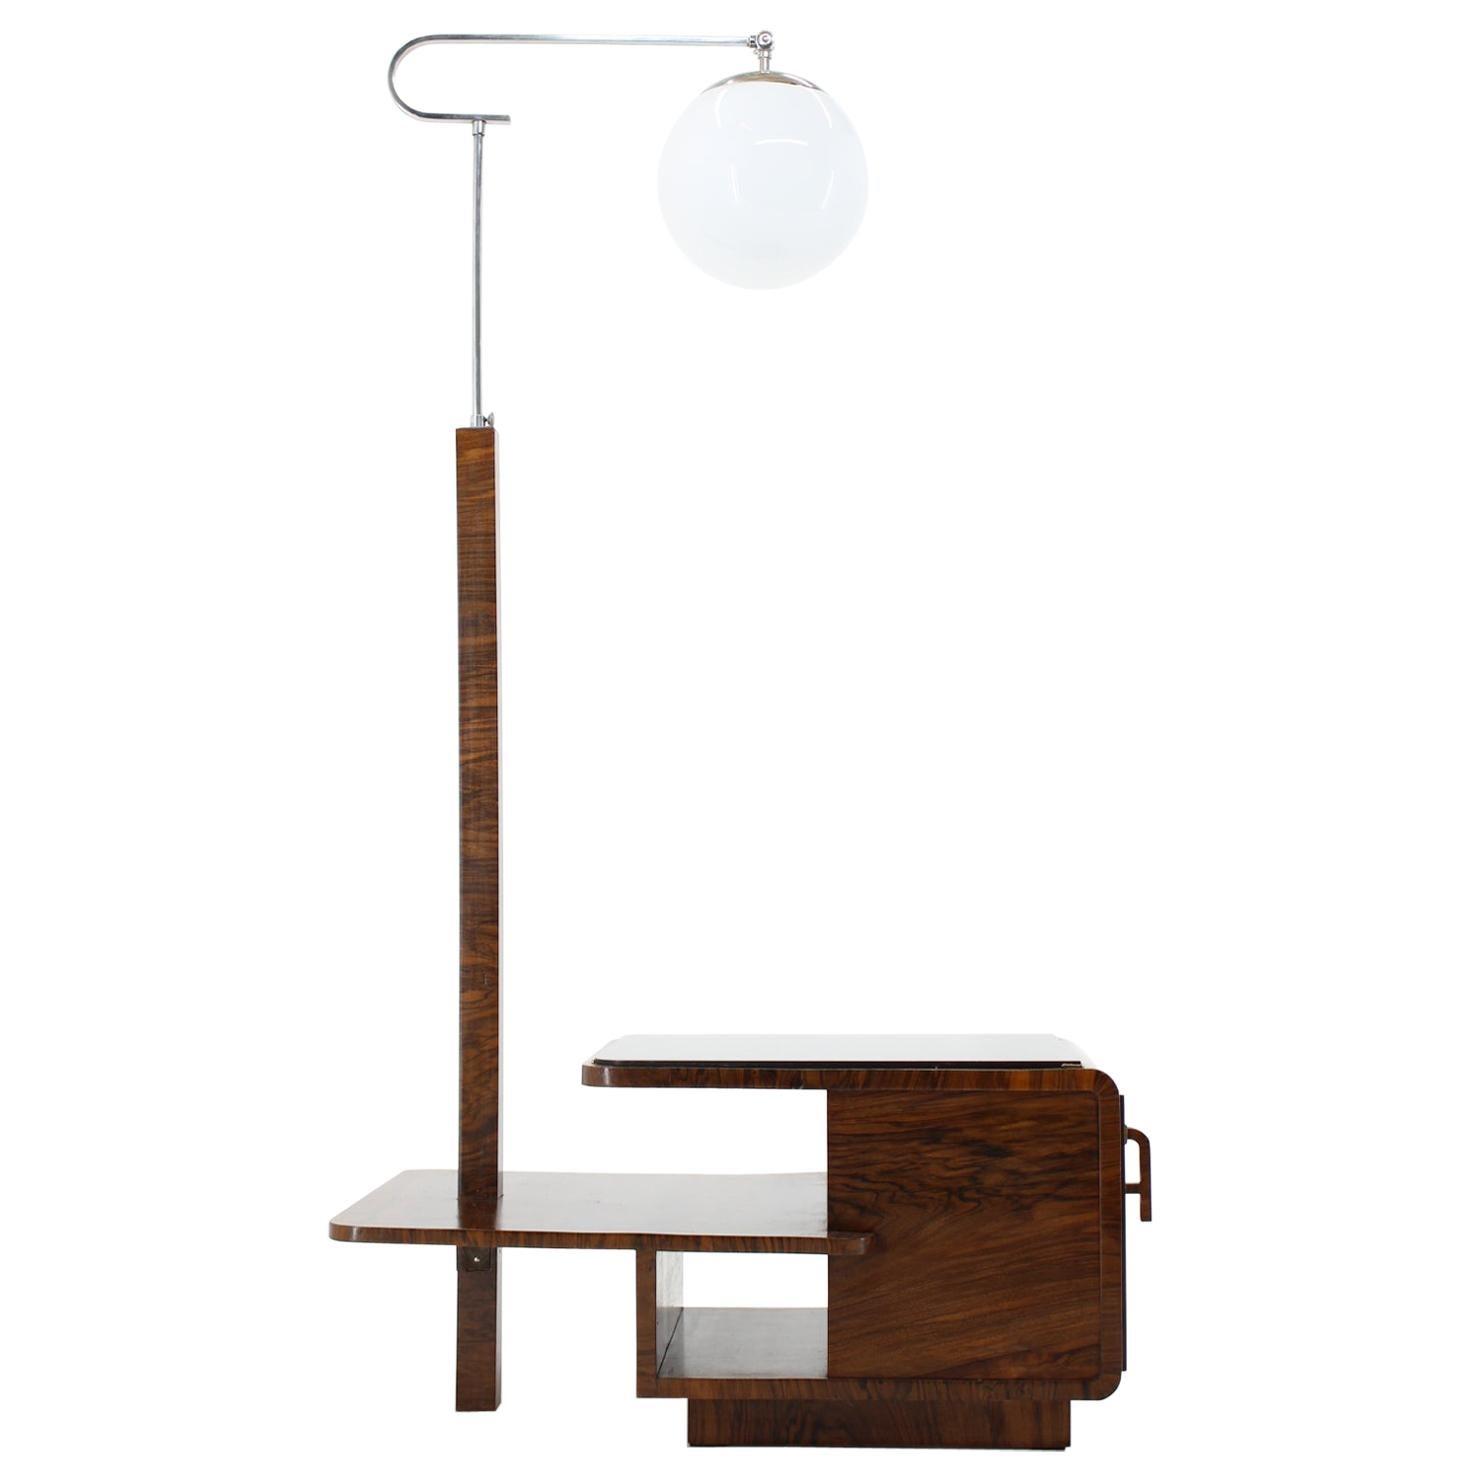 1930s Rare Art Deco Floor Lamp, Czechoslovakia